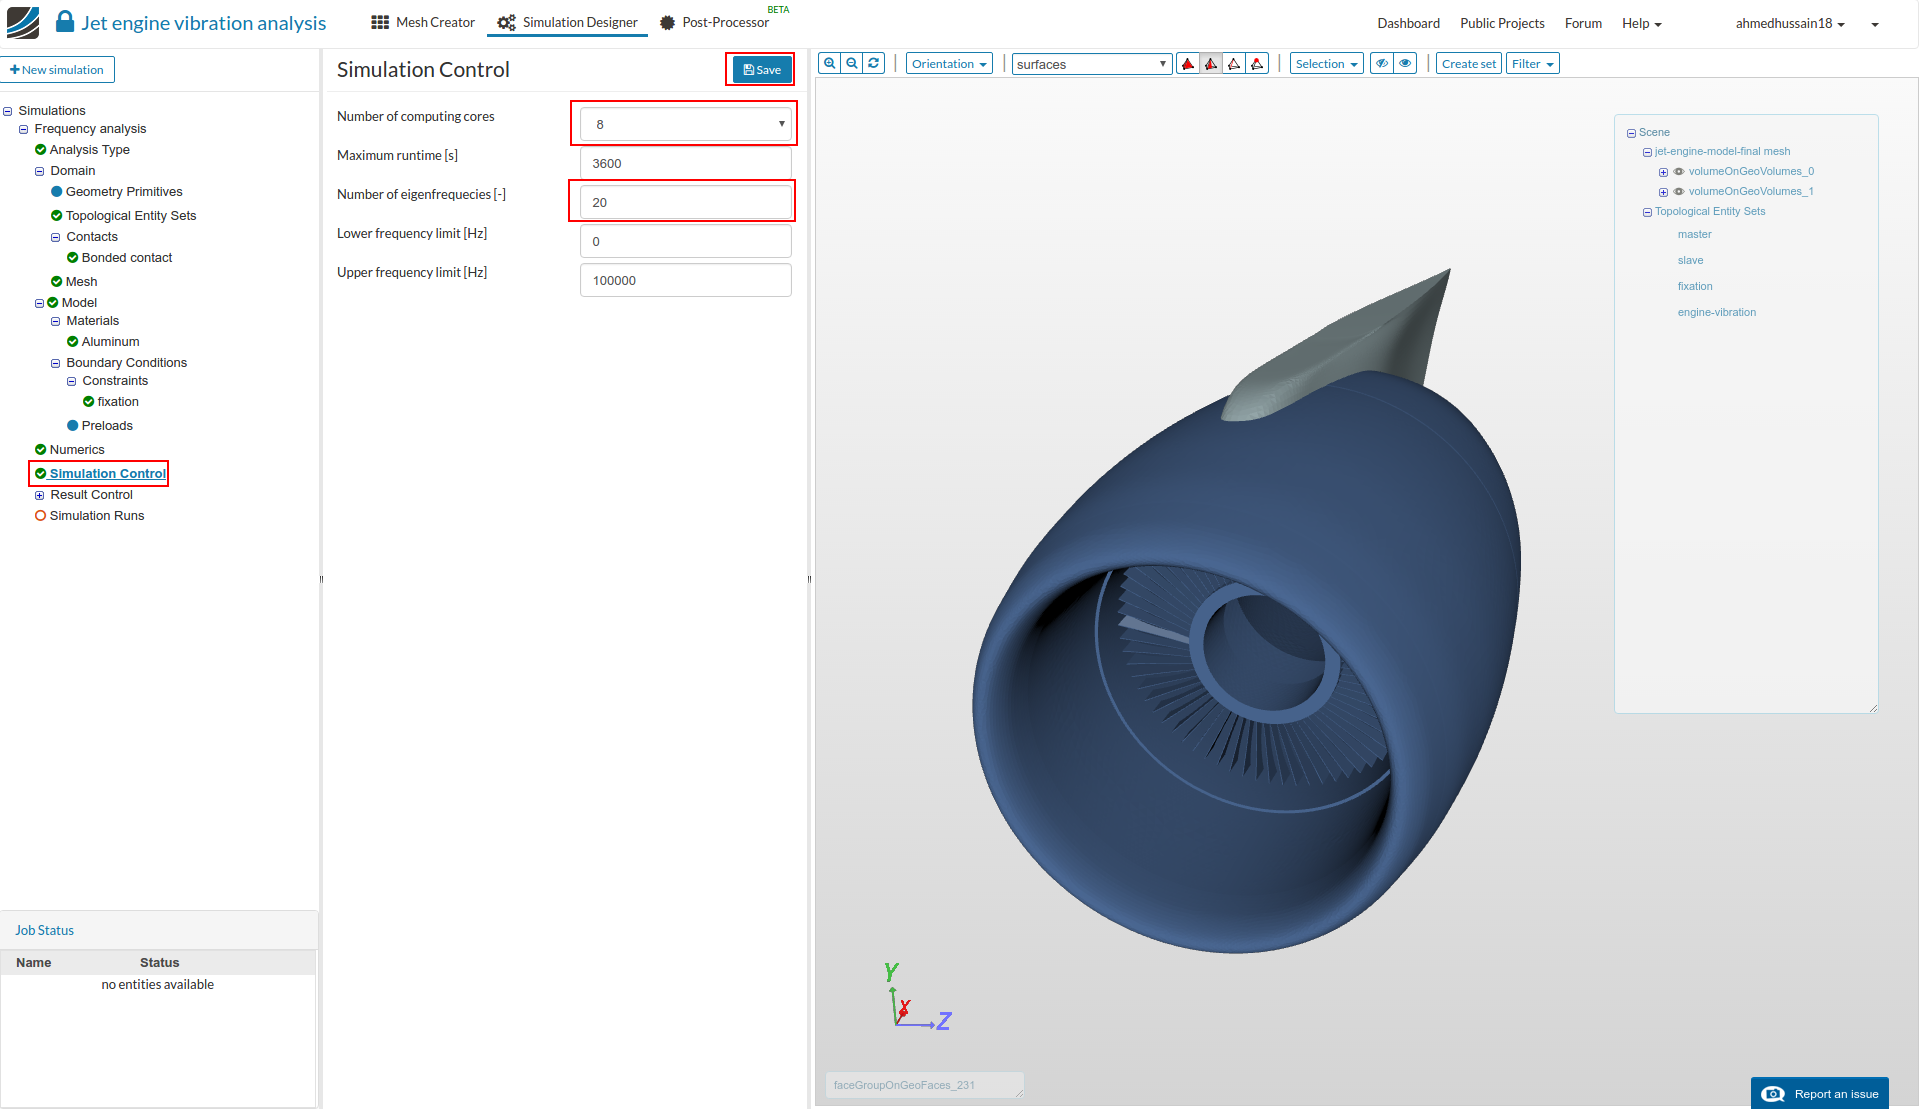 aerospace workshop, aircraft jet engine vibration analysis simulation control